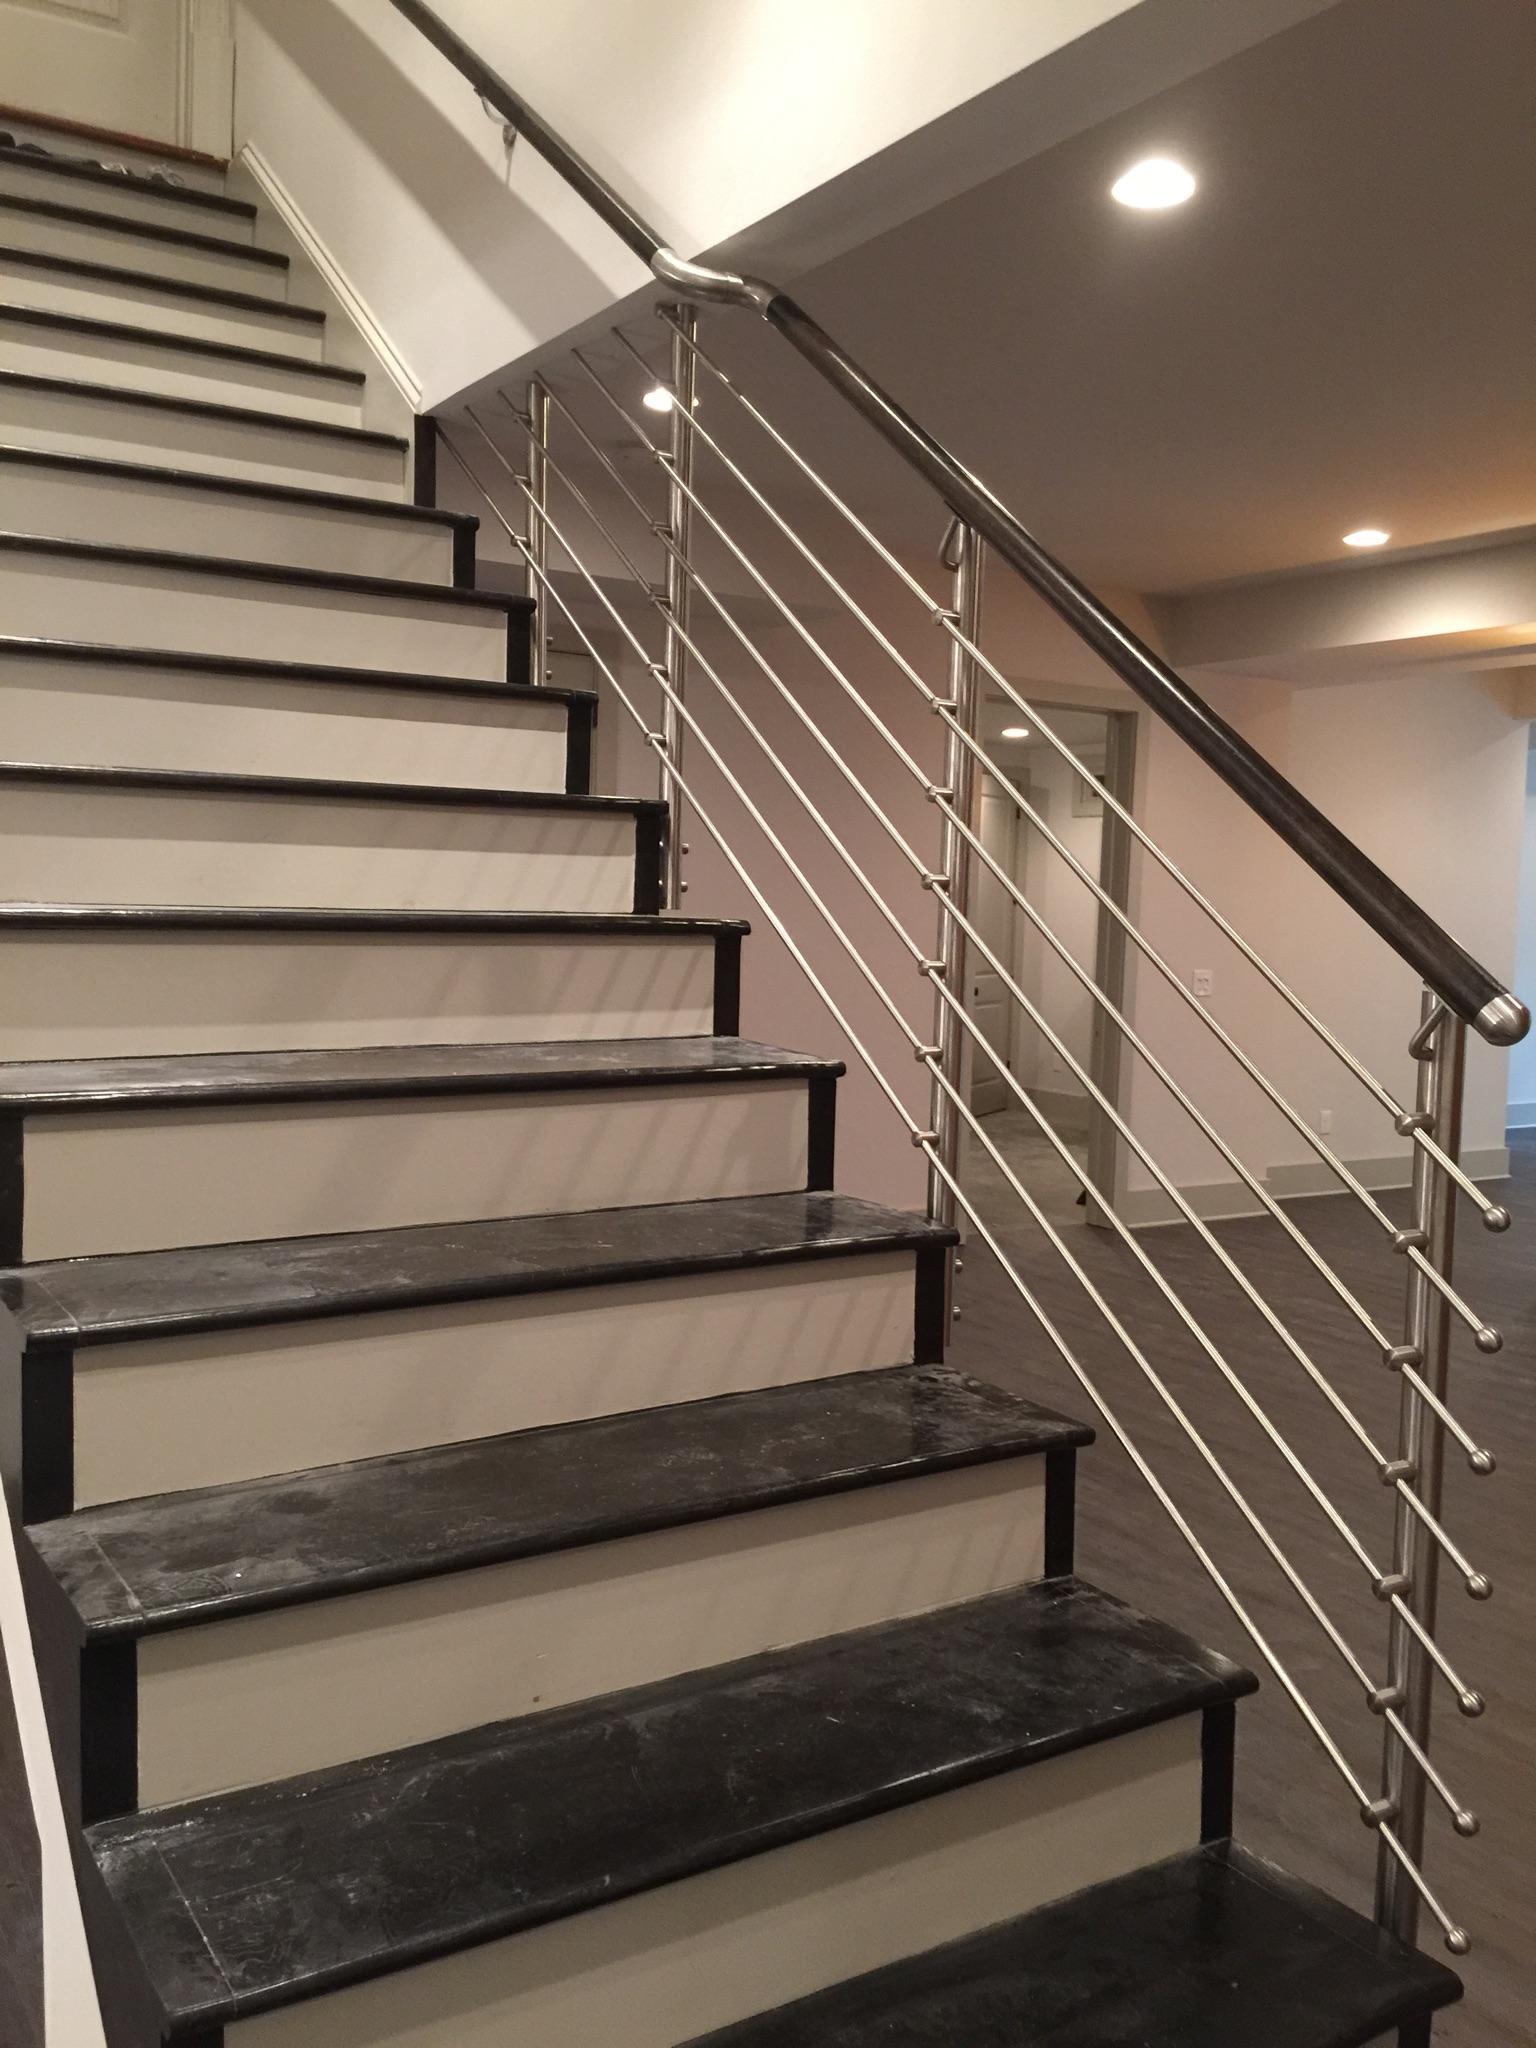 homepage stair solution. Black Bedroom Furniture Sets. Home Design Ideas